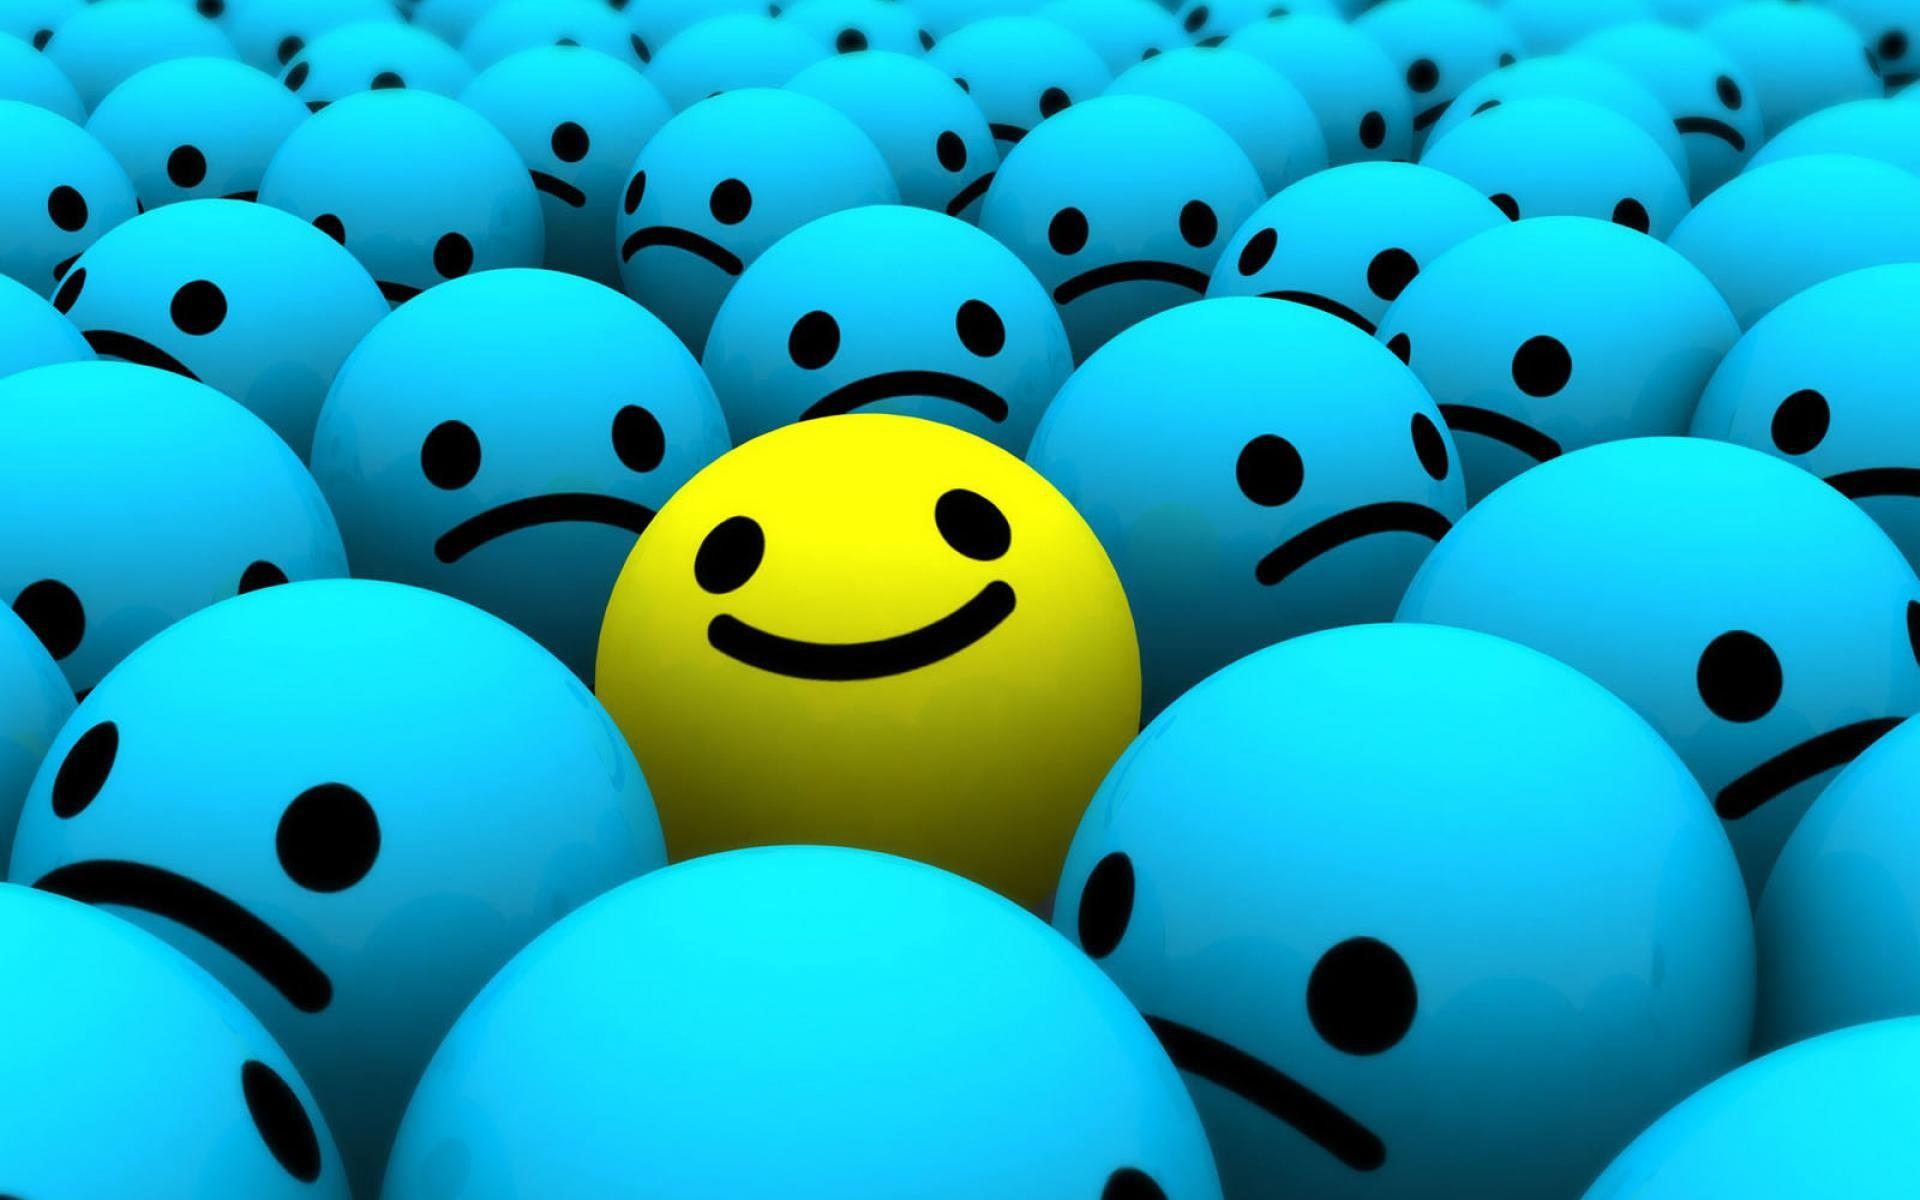 Smile · Smile Wallpaper 31222